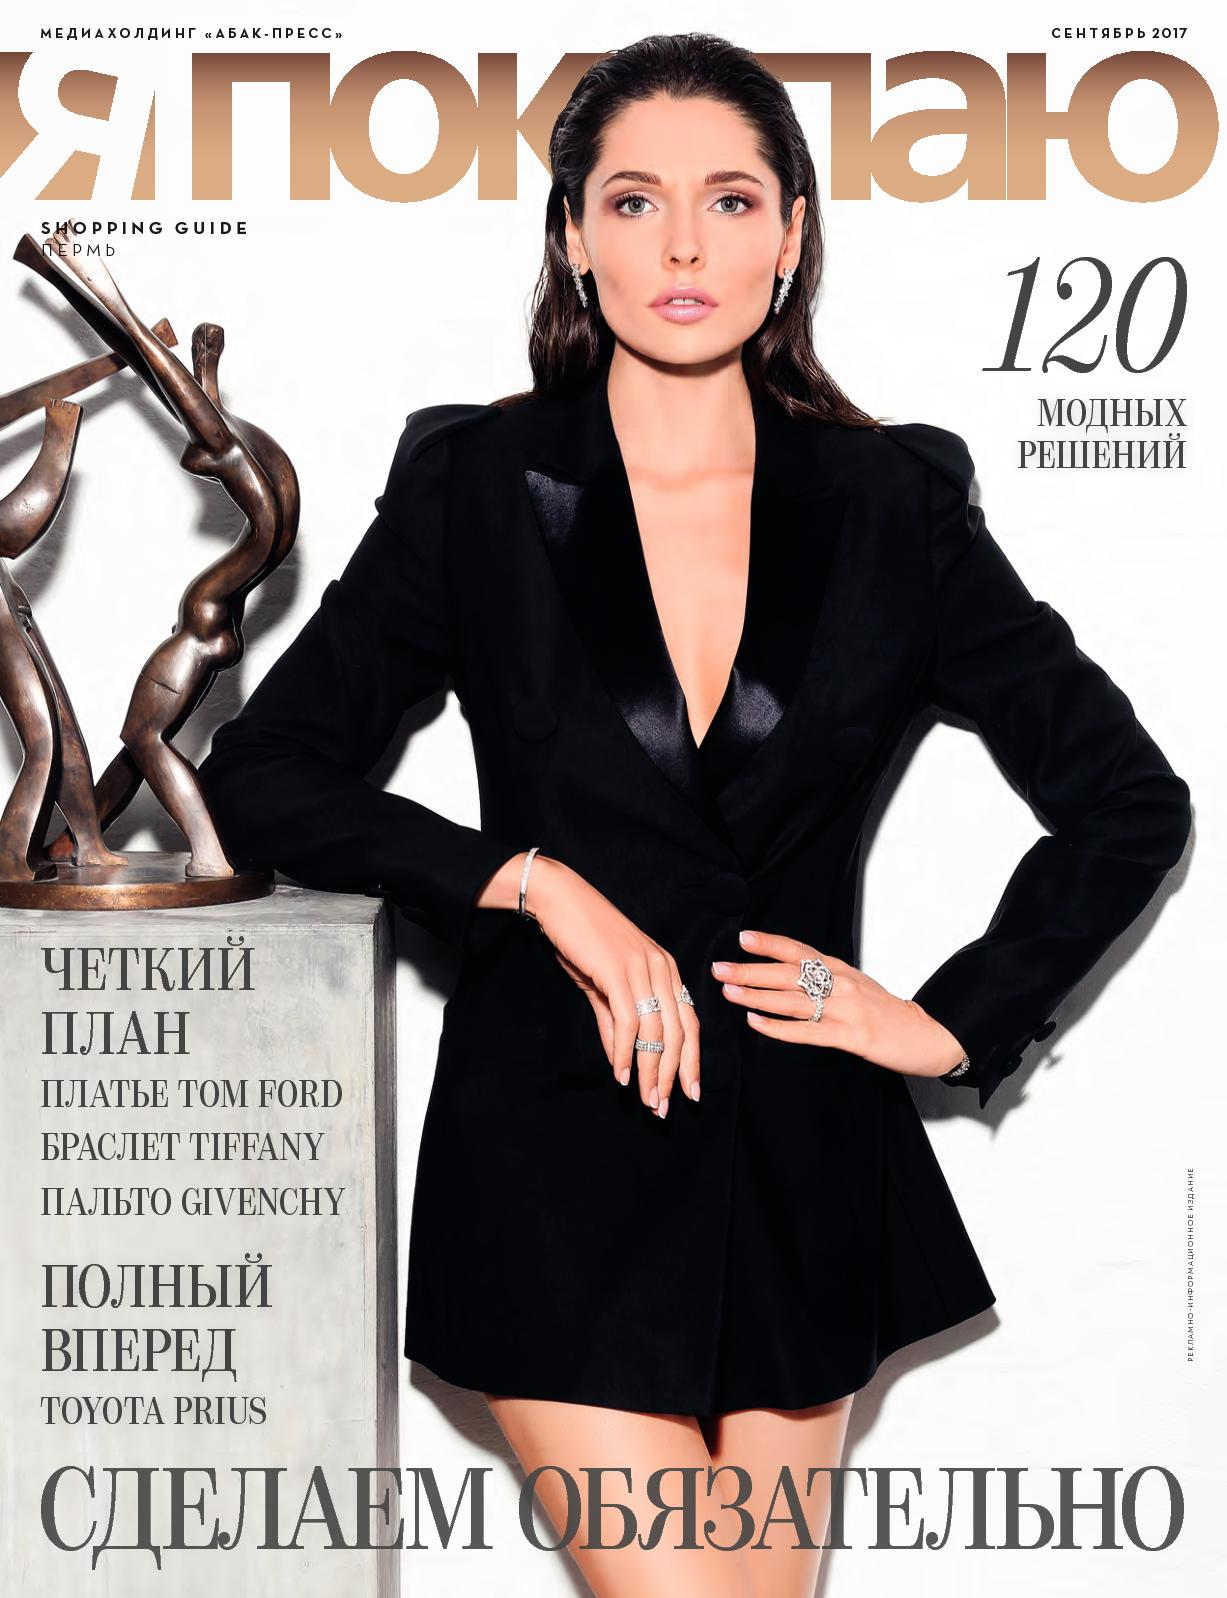 ad816cae332 Calaméo - Shopping Guide «Я Покупаю. Пермь»